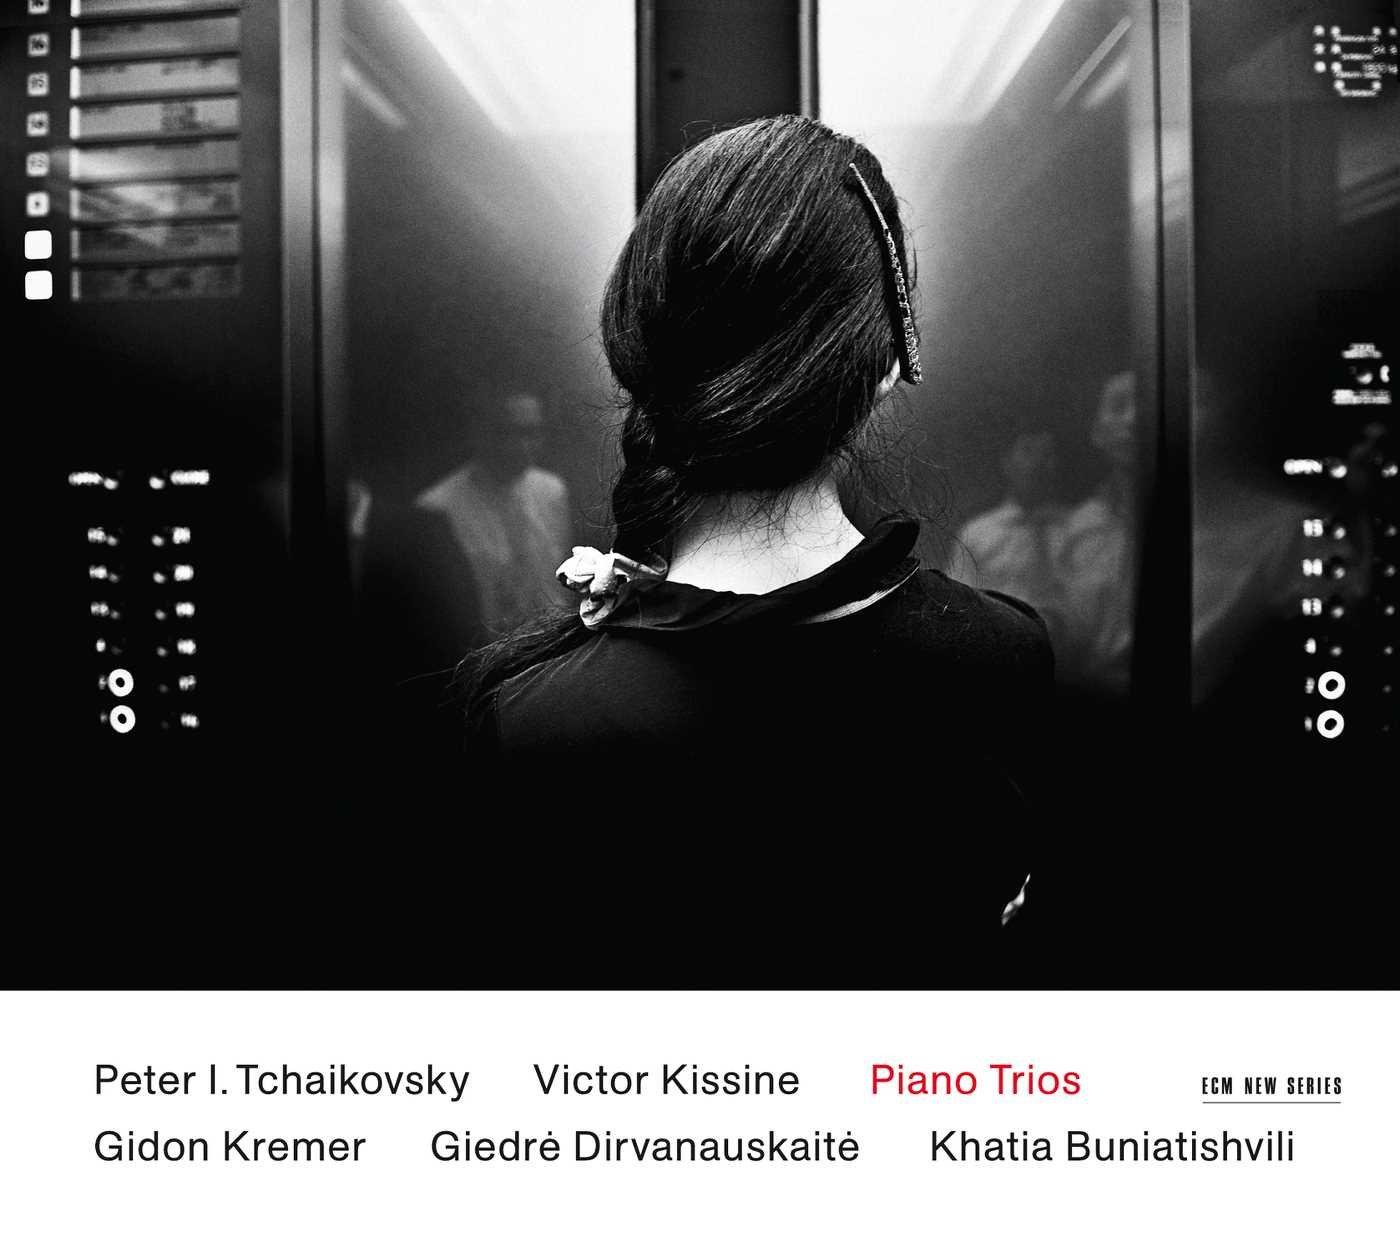 CD : Khatia Buniatishvili - Kissinet / Tchaikovsky Piano Trios (O-Card Packaging)